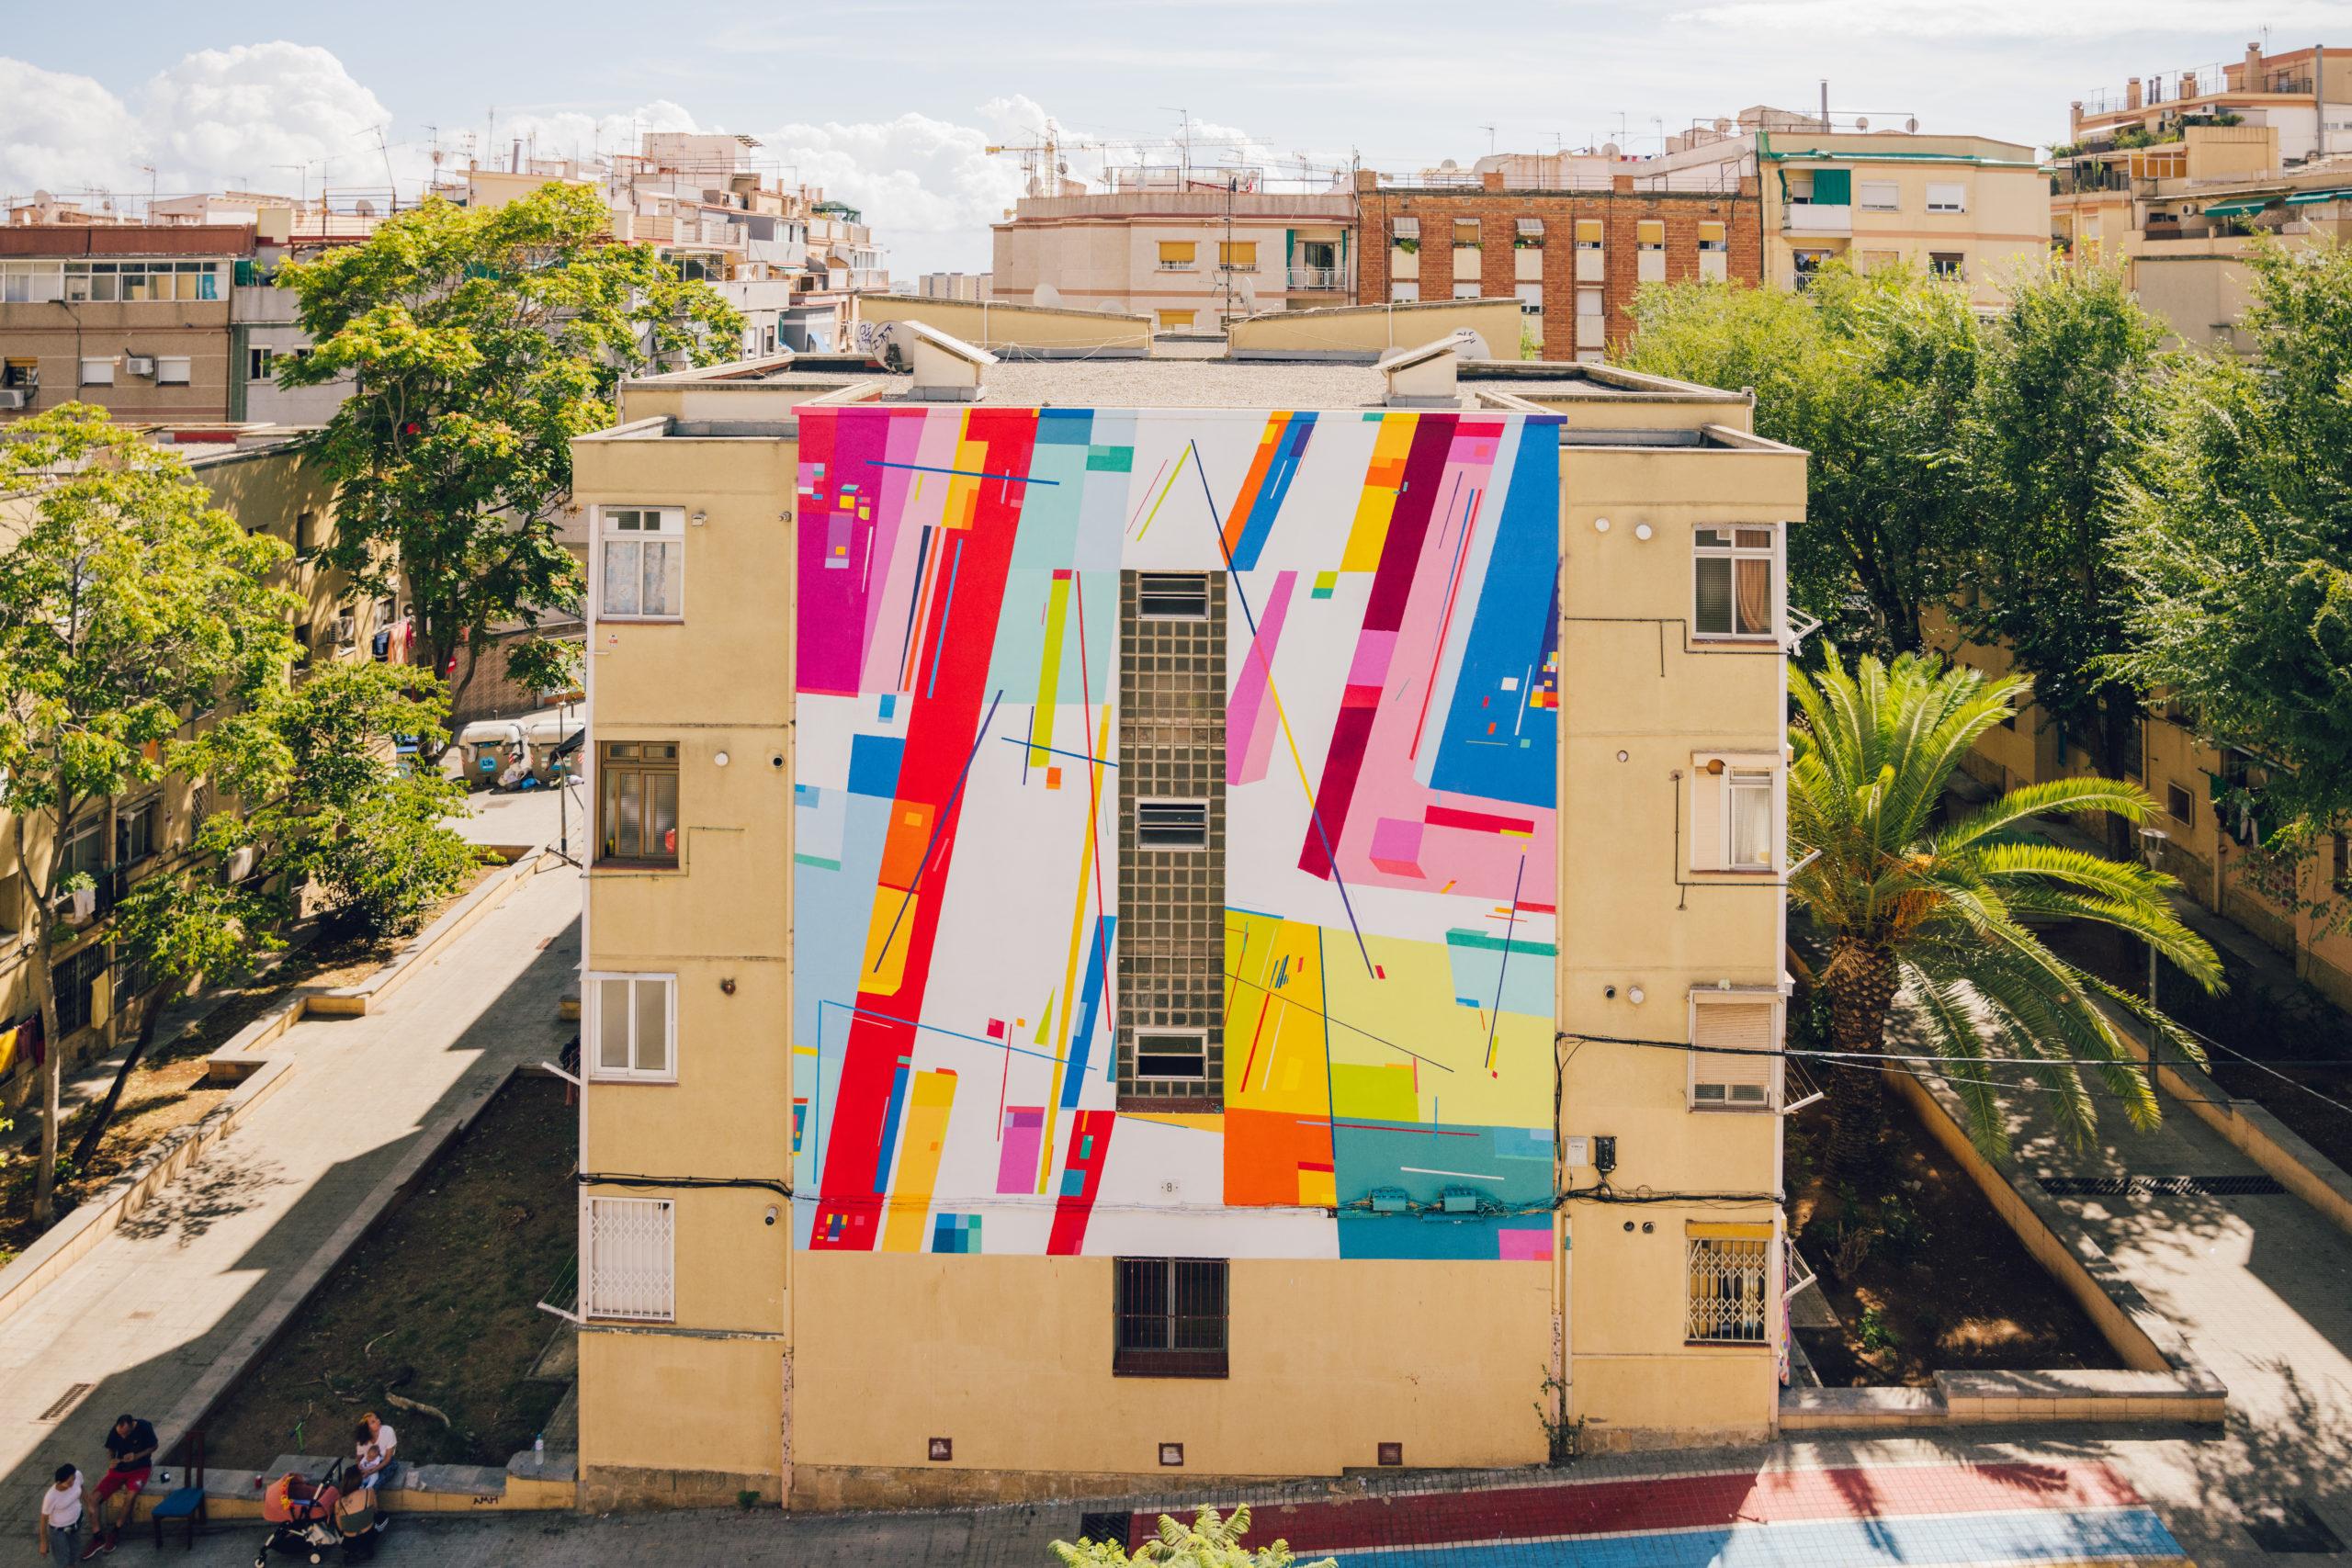 Mural de arte urbano en Hospitalet, cataluña